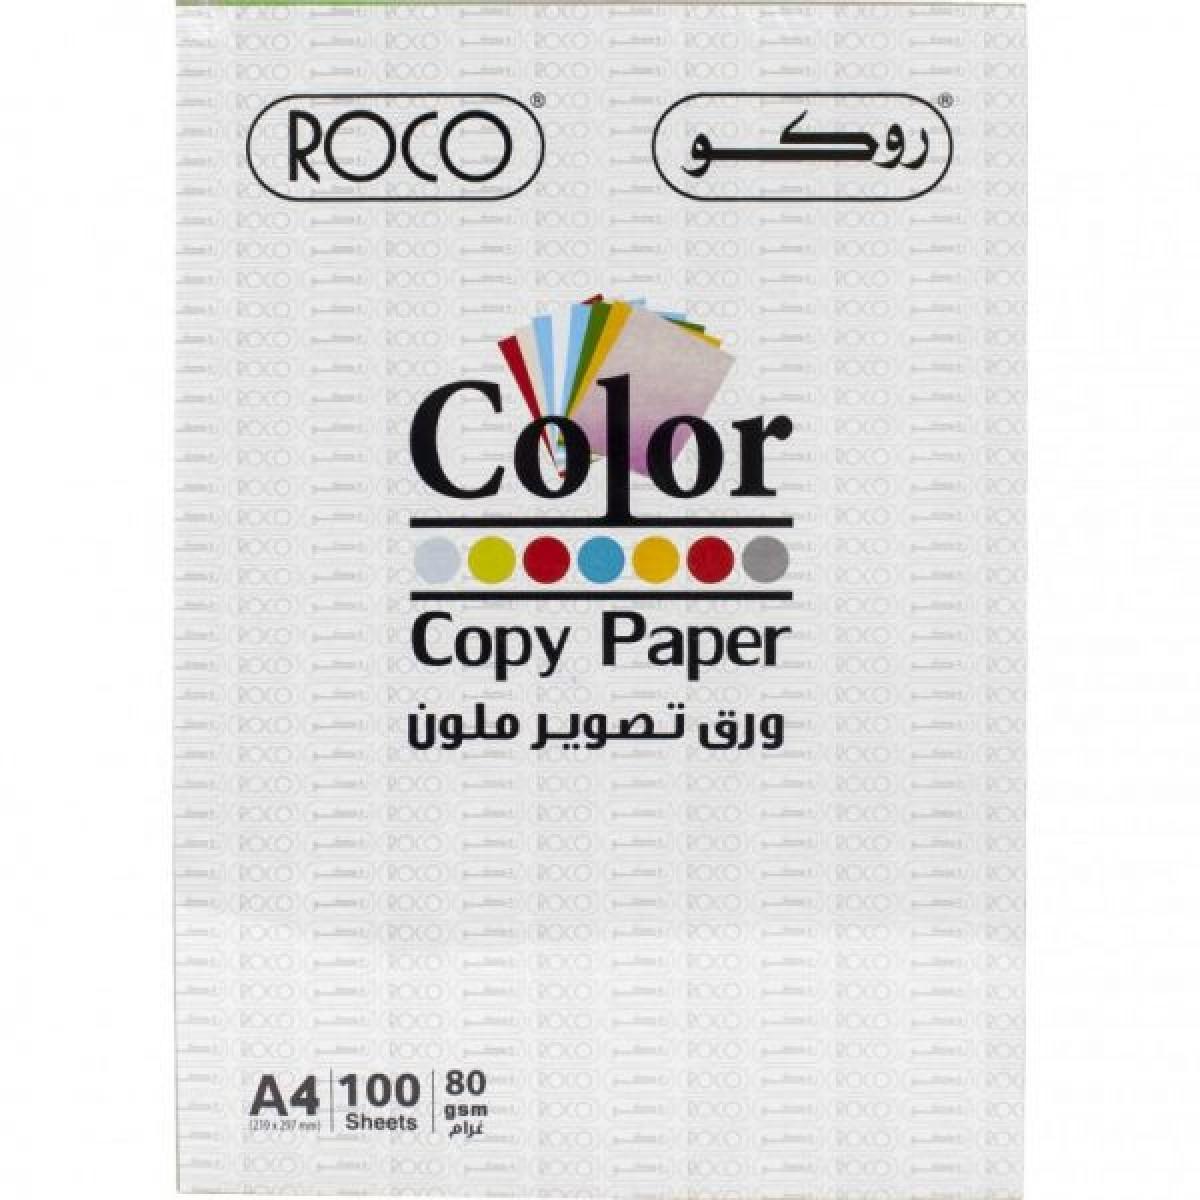 ورق تصوير روكو ملون - 100ورقة - A4